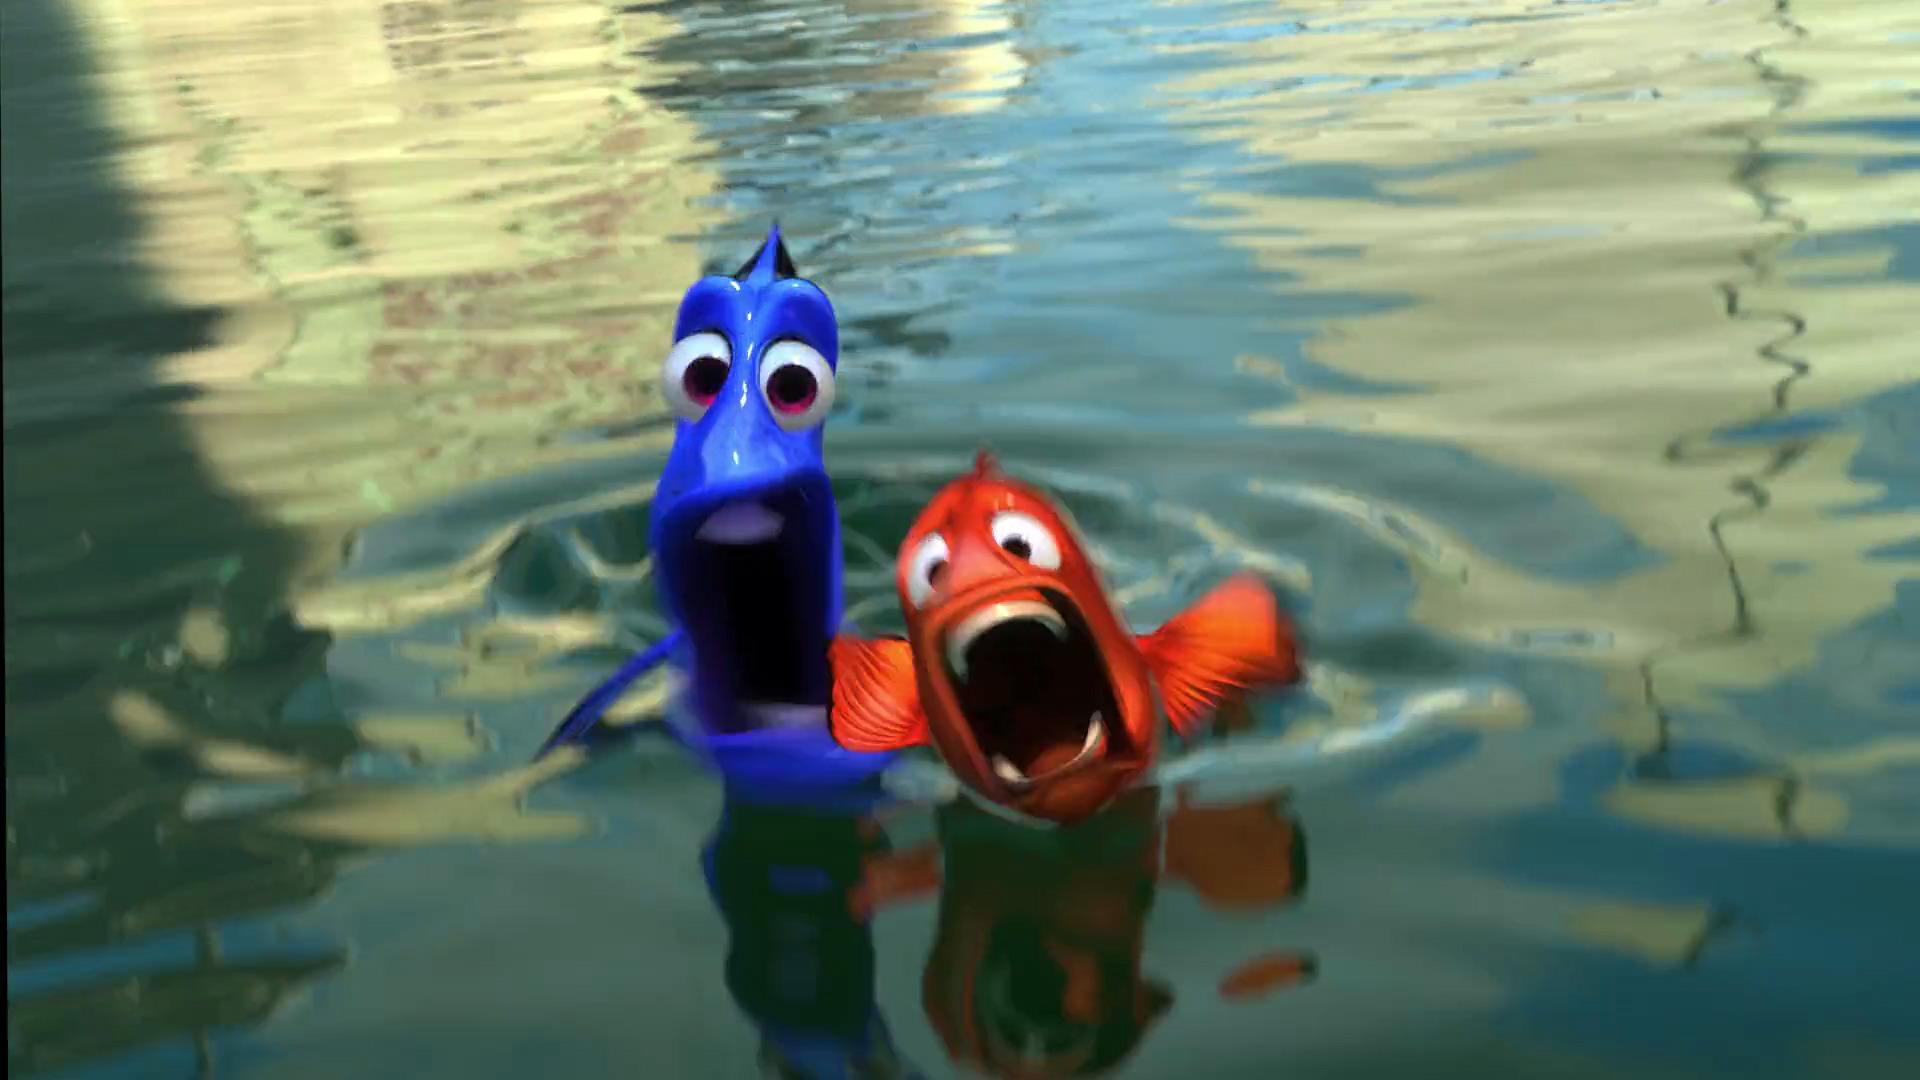 Finding Nemo on Finding Nemo